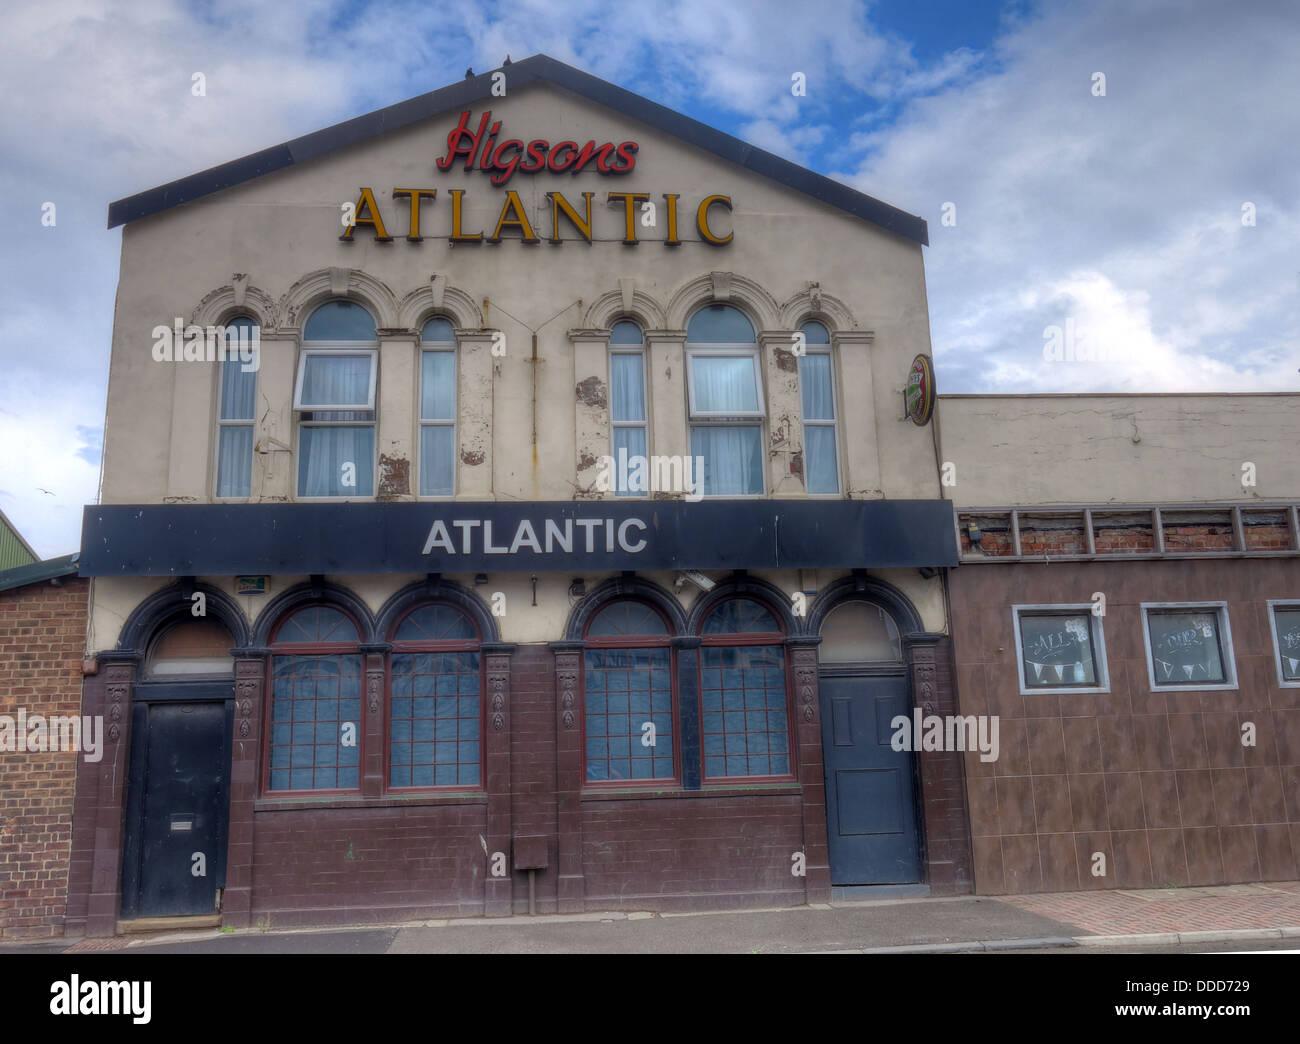 The Atlantic Pub, Higsons, Dock road, Liverpool L20 8DD - Stock Image